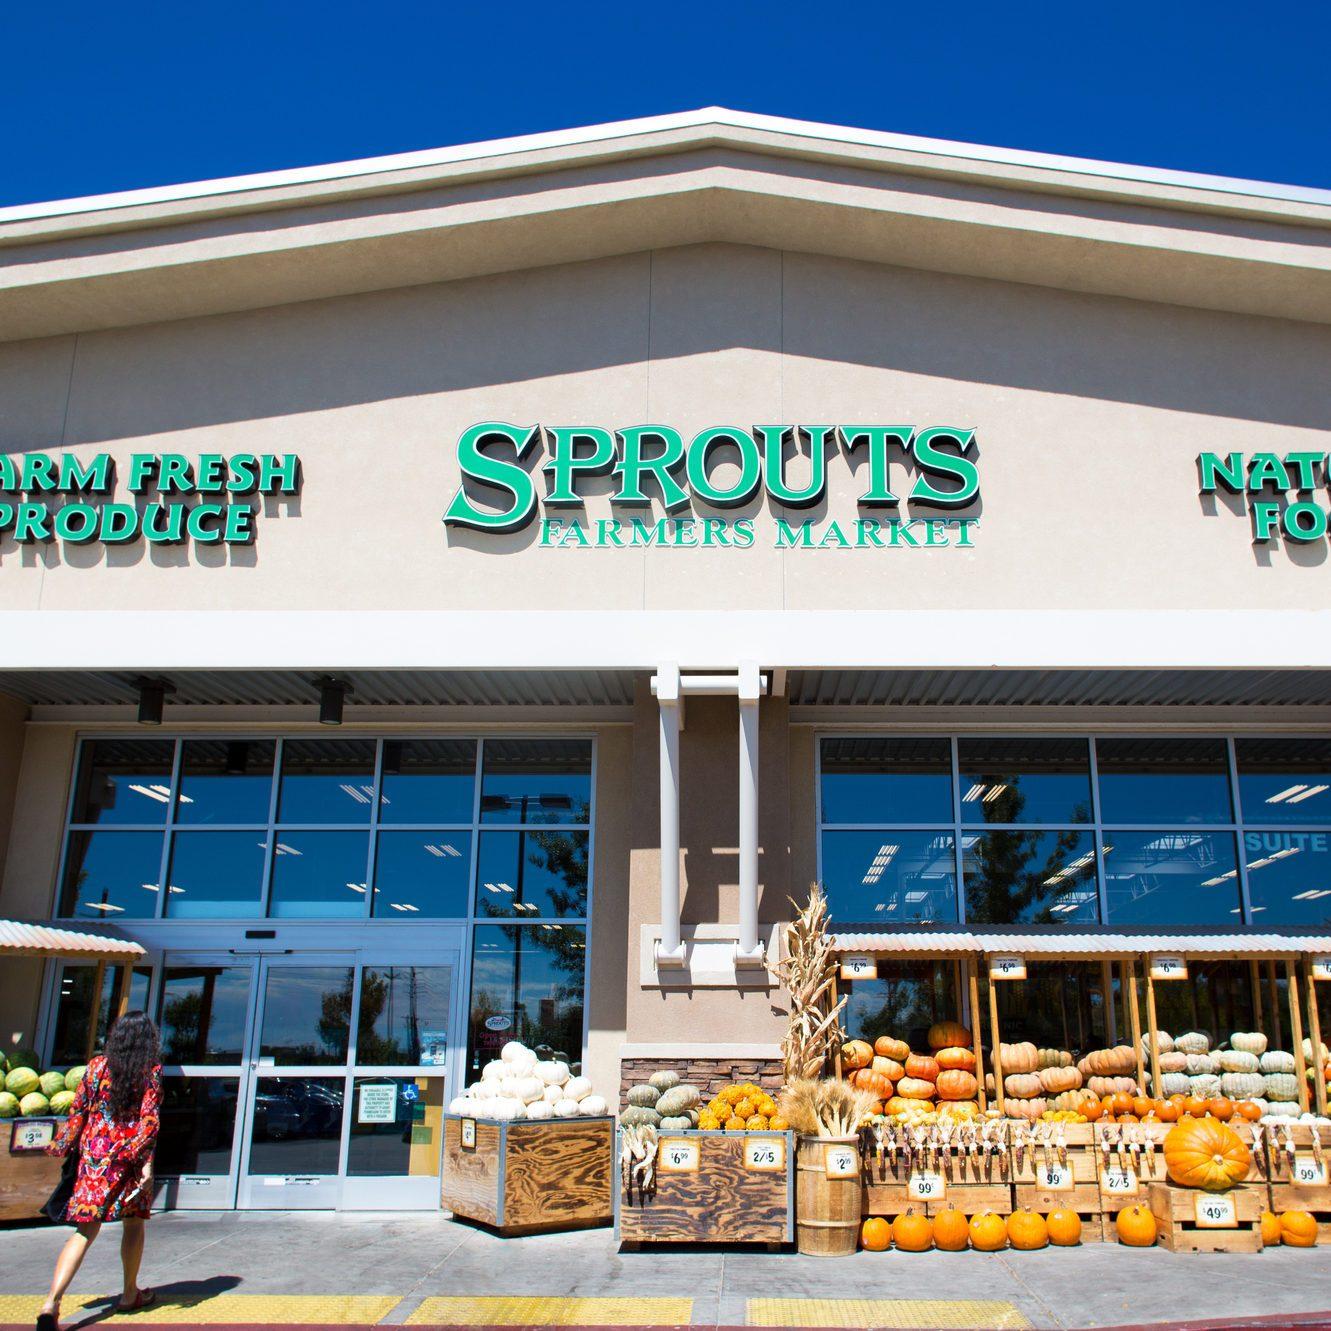 Santa Fe, NM: Woman Enters Sprouts Farmers Market